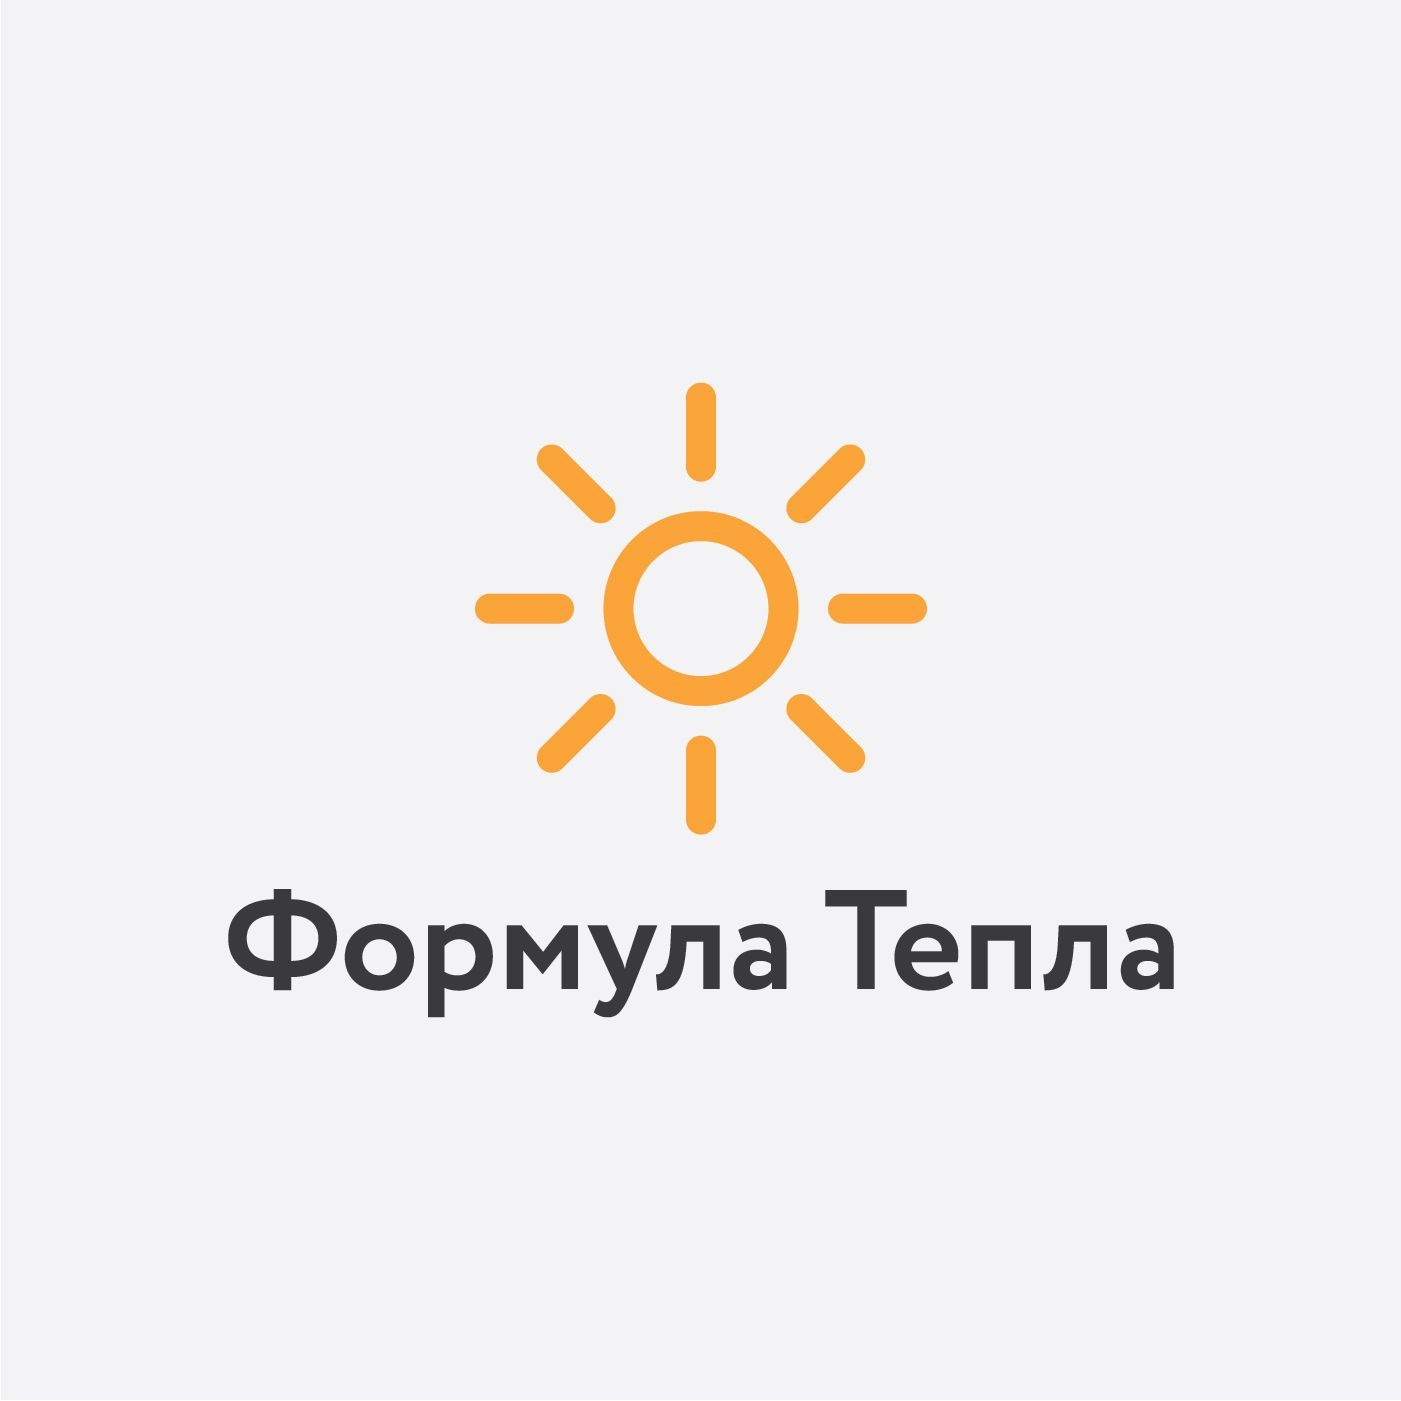 Логотип для компании Формула Тепла - дизайнер rikozi